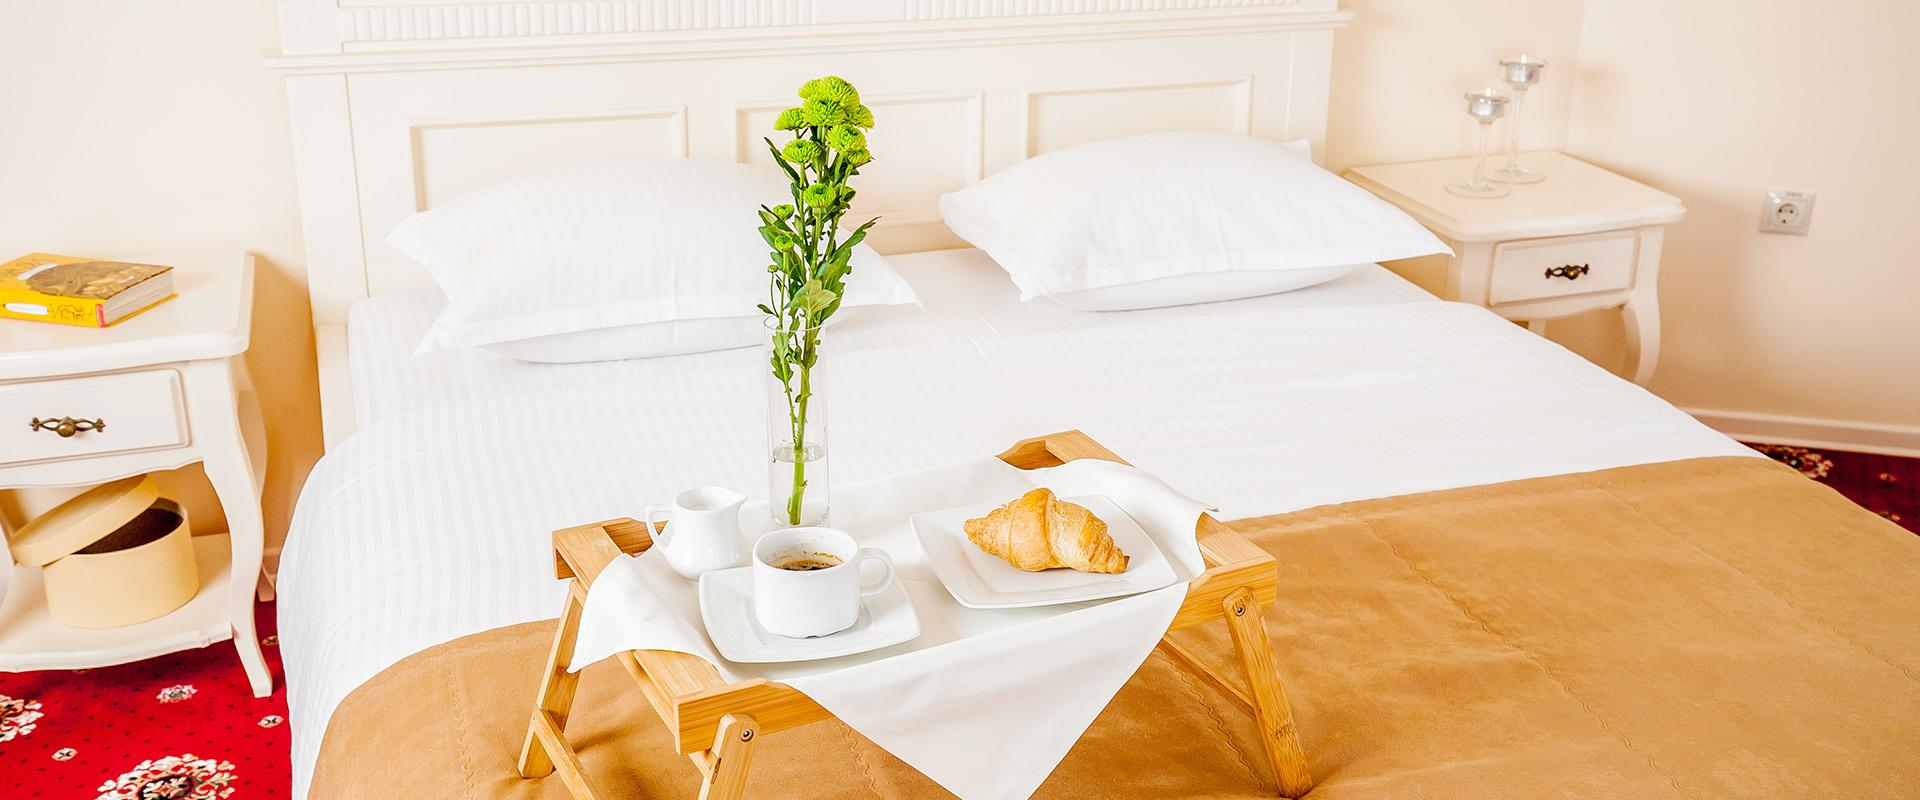 Standardspa-hotel Respect